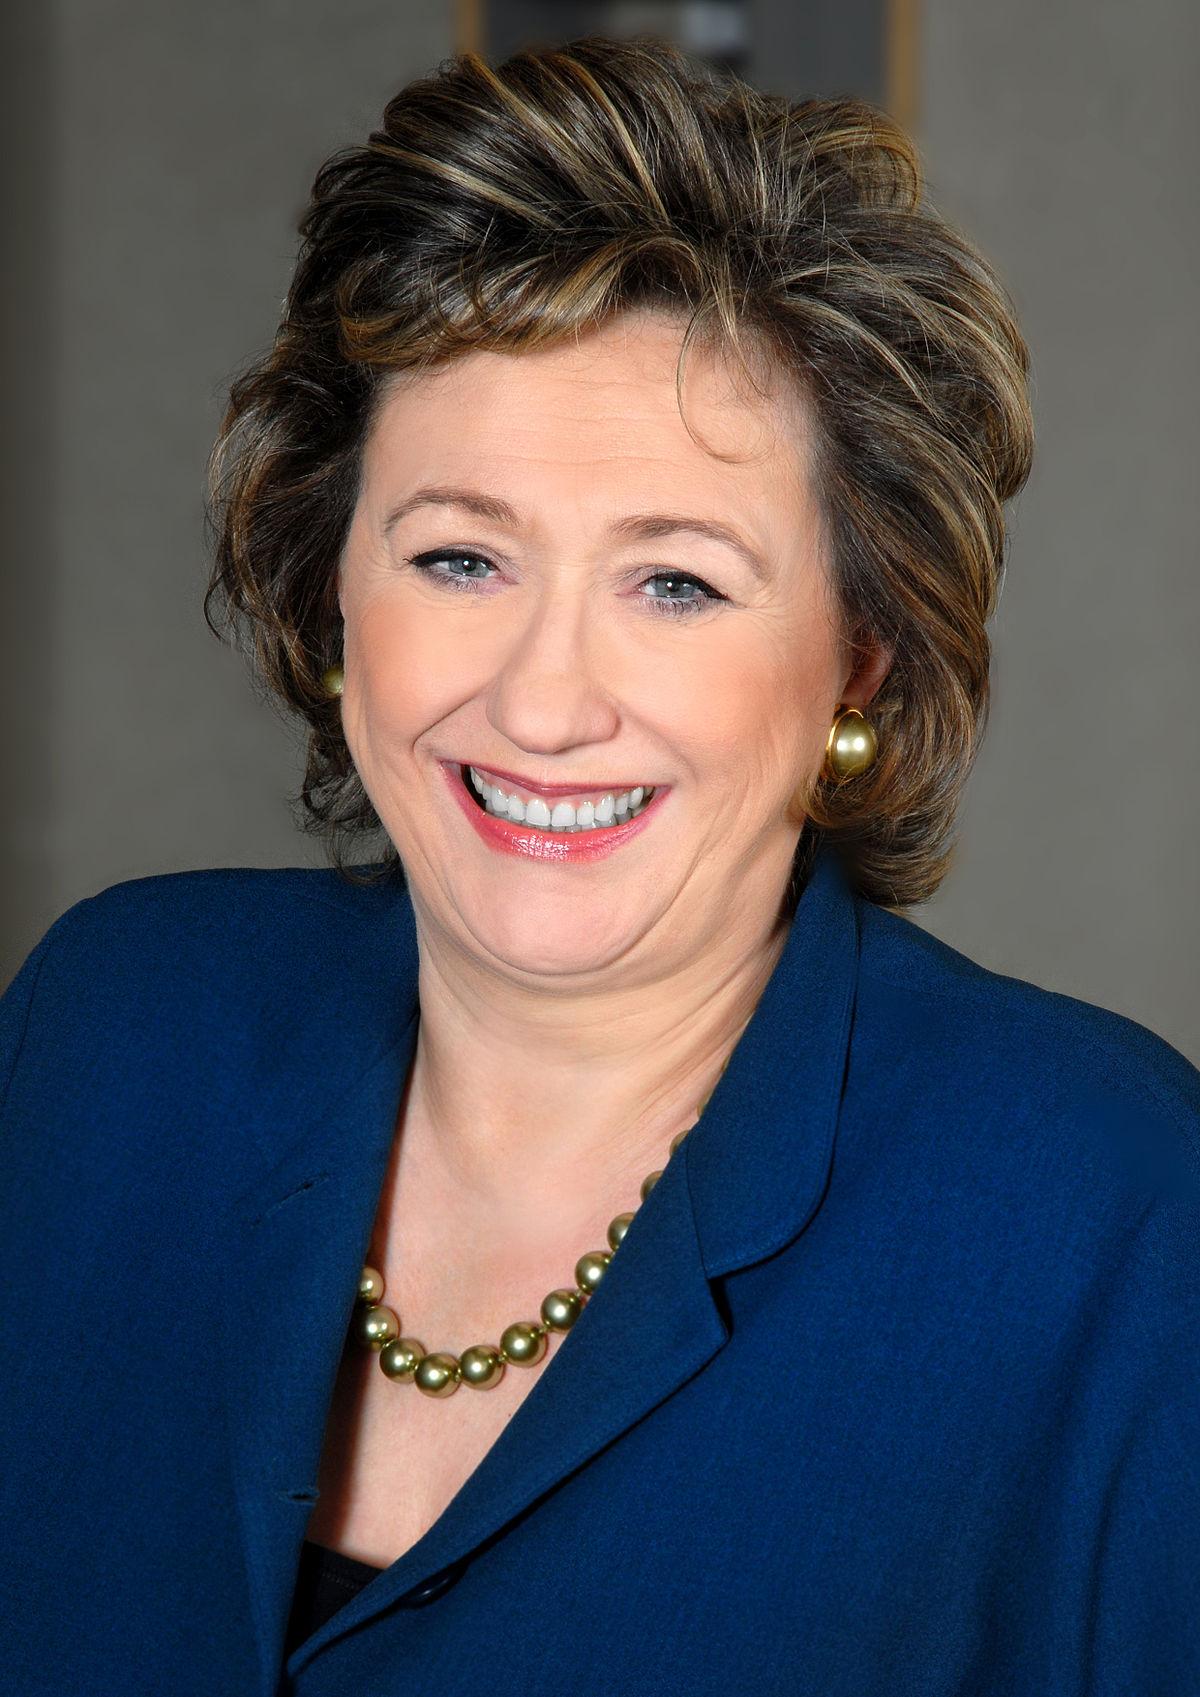 Rosemary Squire Wikipedia